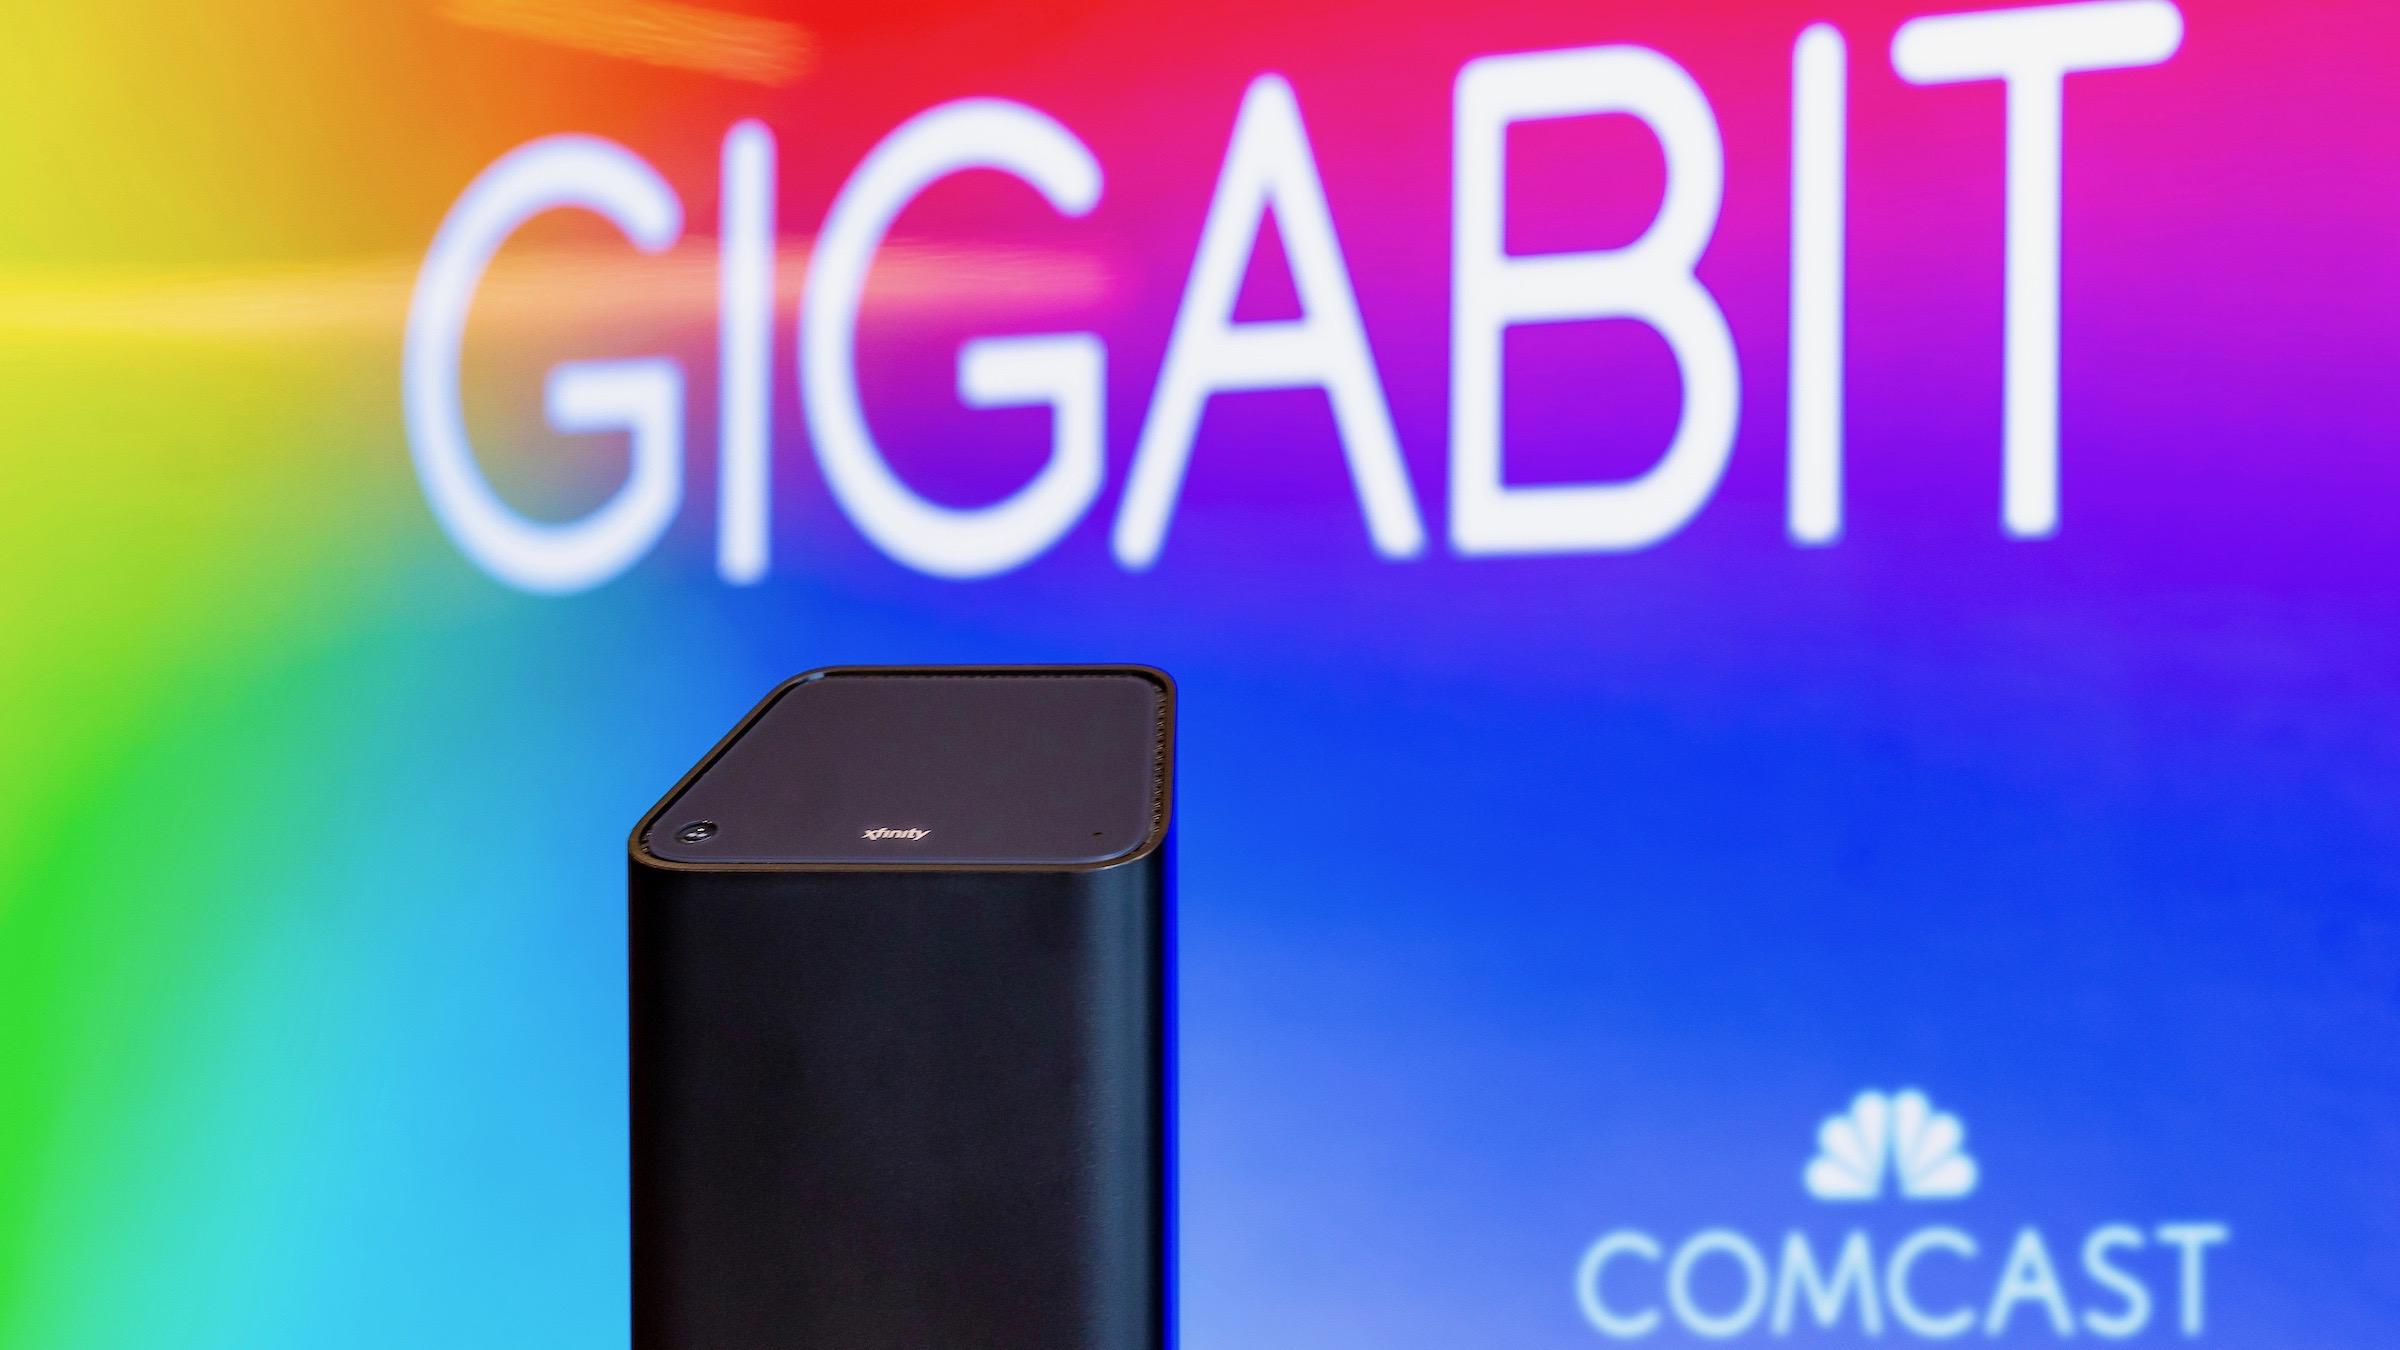 Comcast is Nation's Number One Provider of Gigabit ...